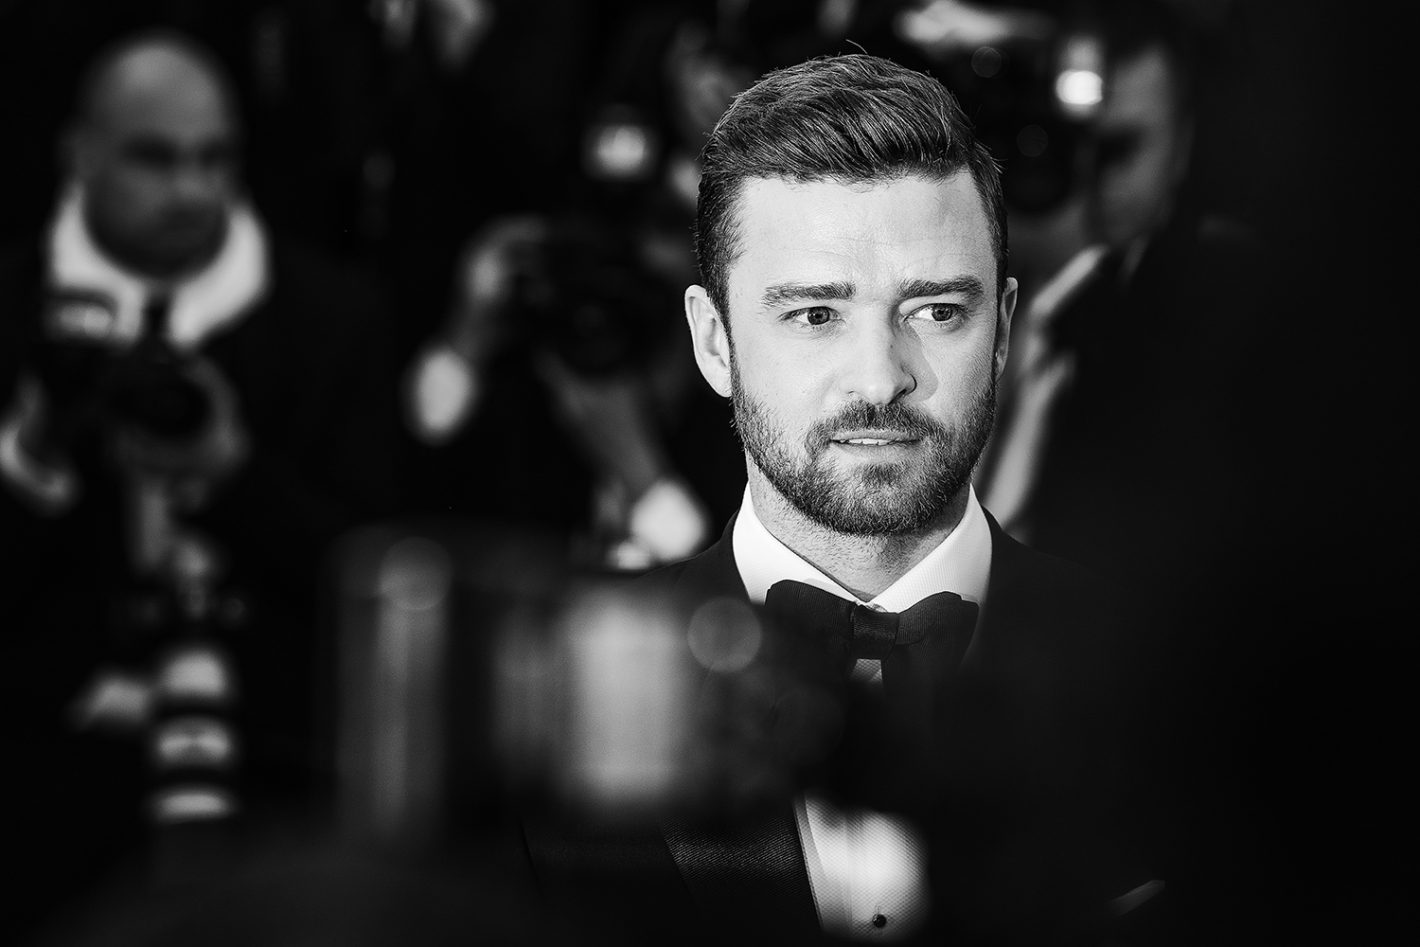 Festival de Cannes 2016 - Justin Timberlake - Nikon D5